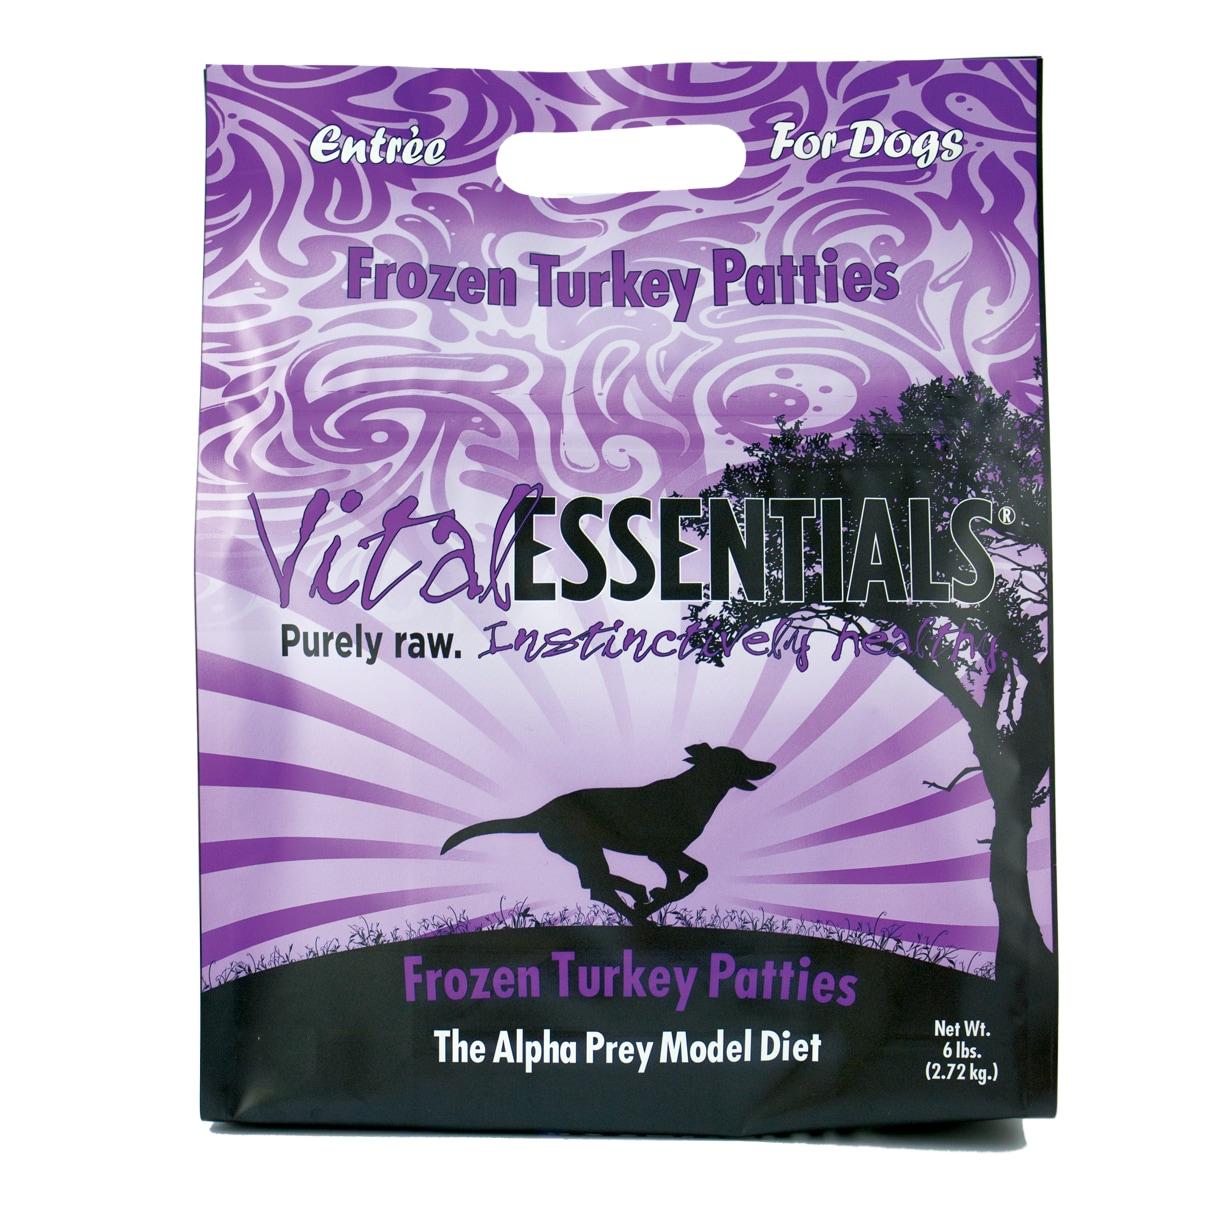 Vital Essentials Turkey Frozen 8z Patties Entrée 6lbs